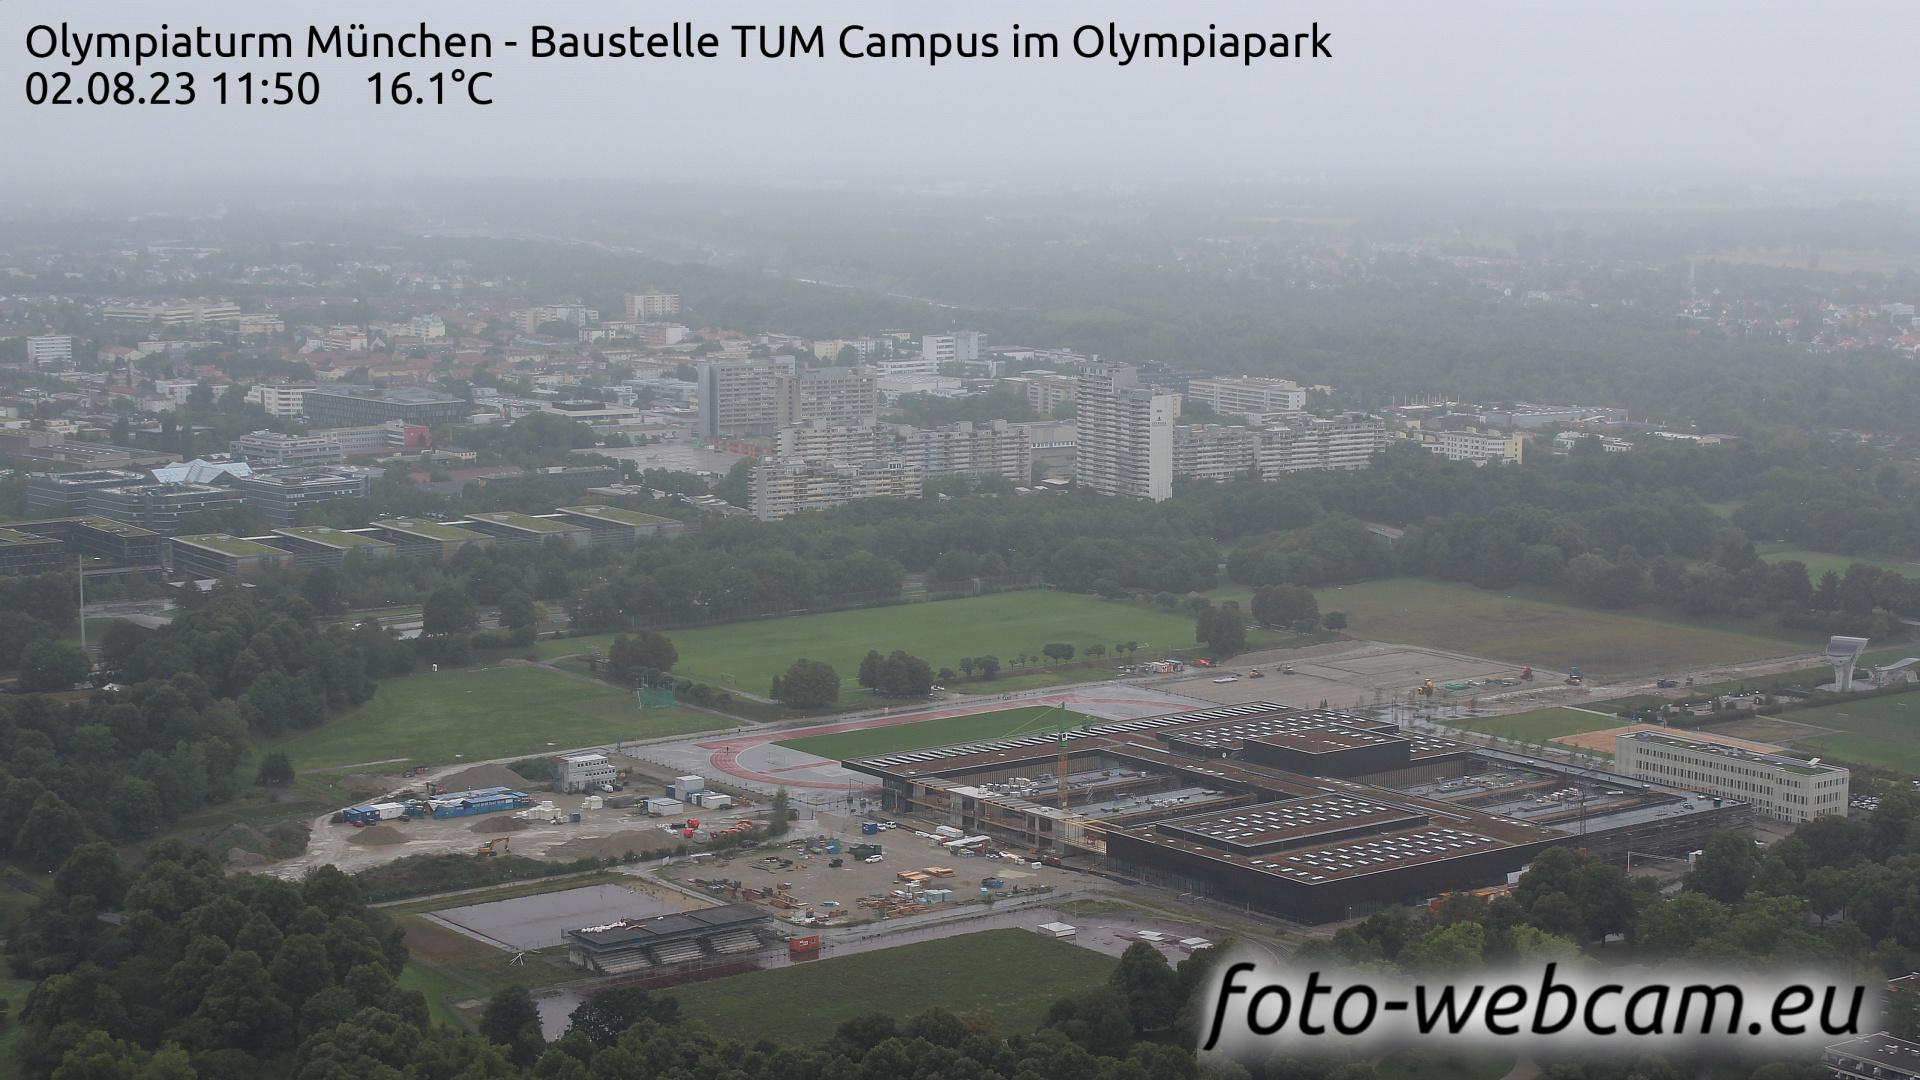 Munich Tue. 11:30